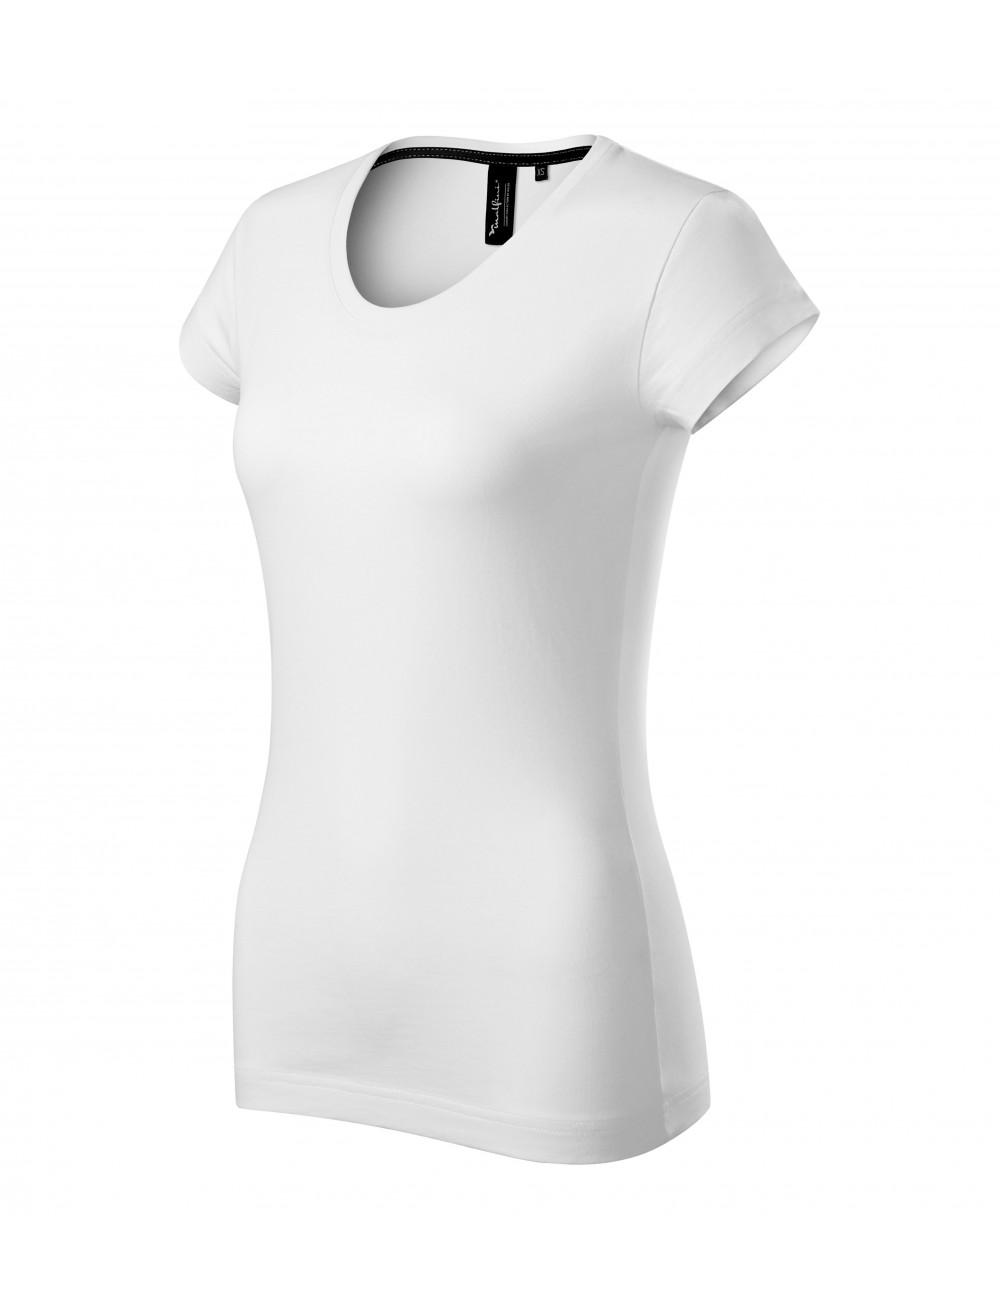 Adler MALFINIPREMIUM Koszulka damska Exclusive 154 biały